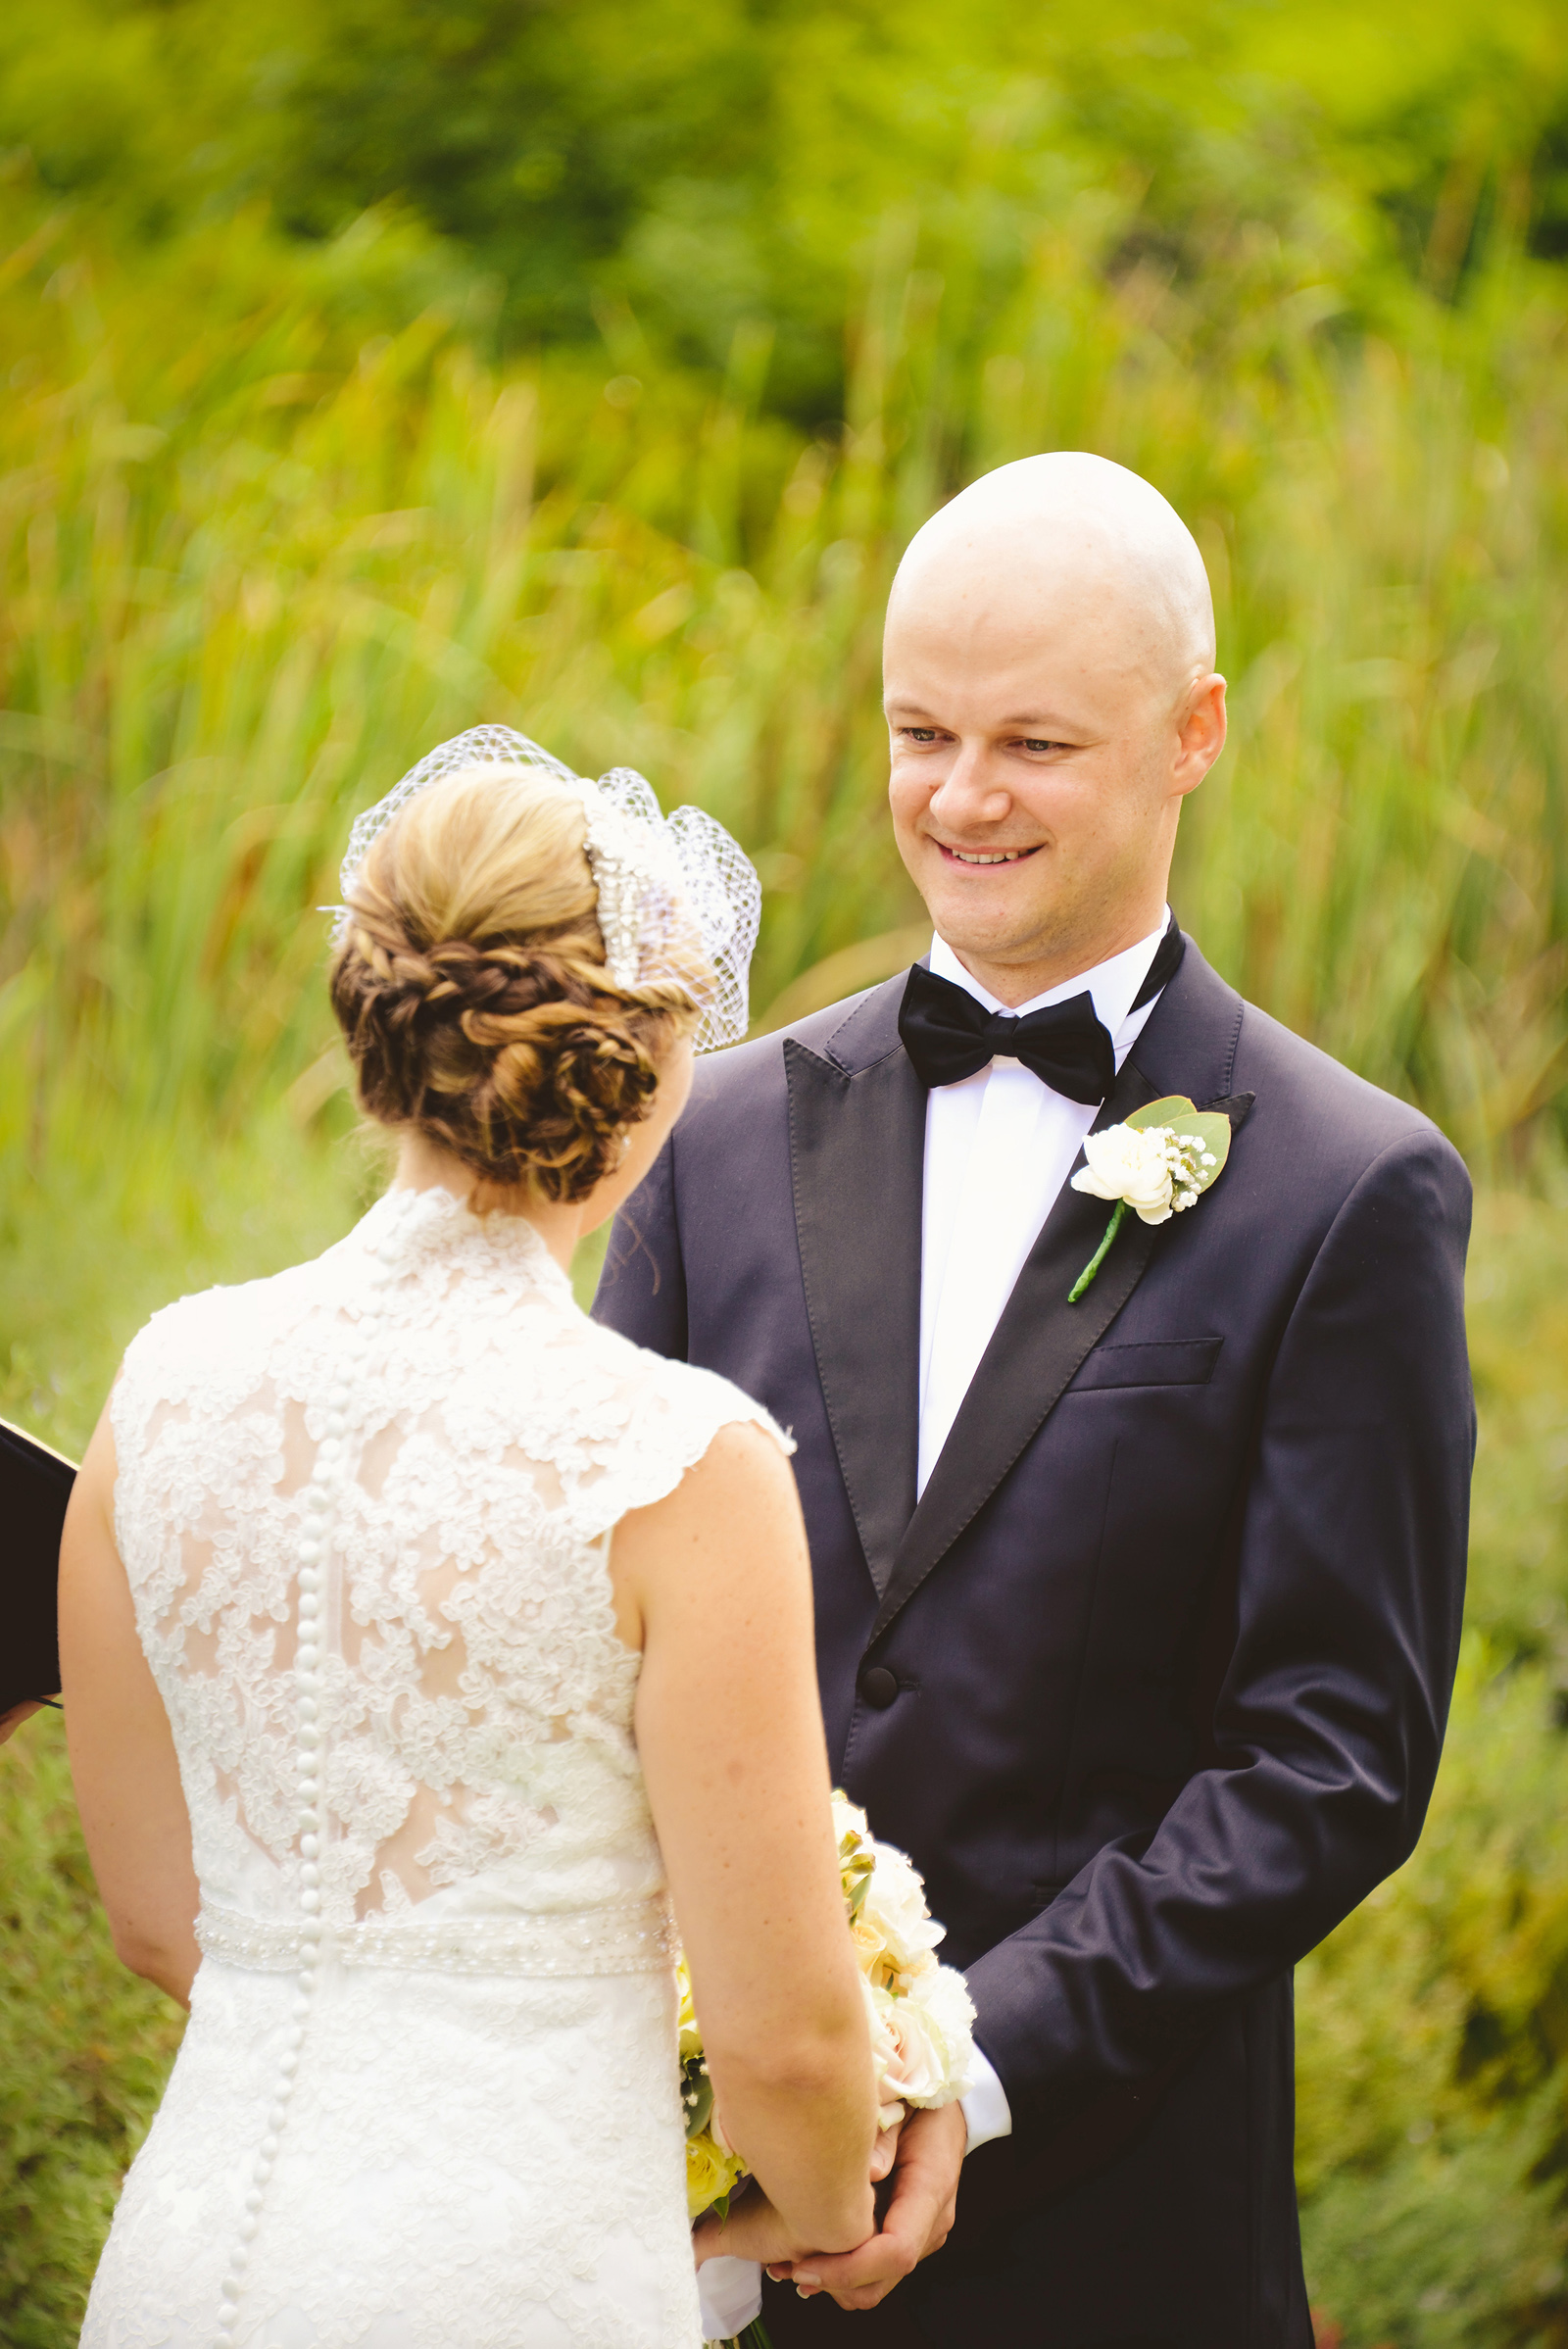 Amy_Tim_Garden-Wedding_020